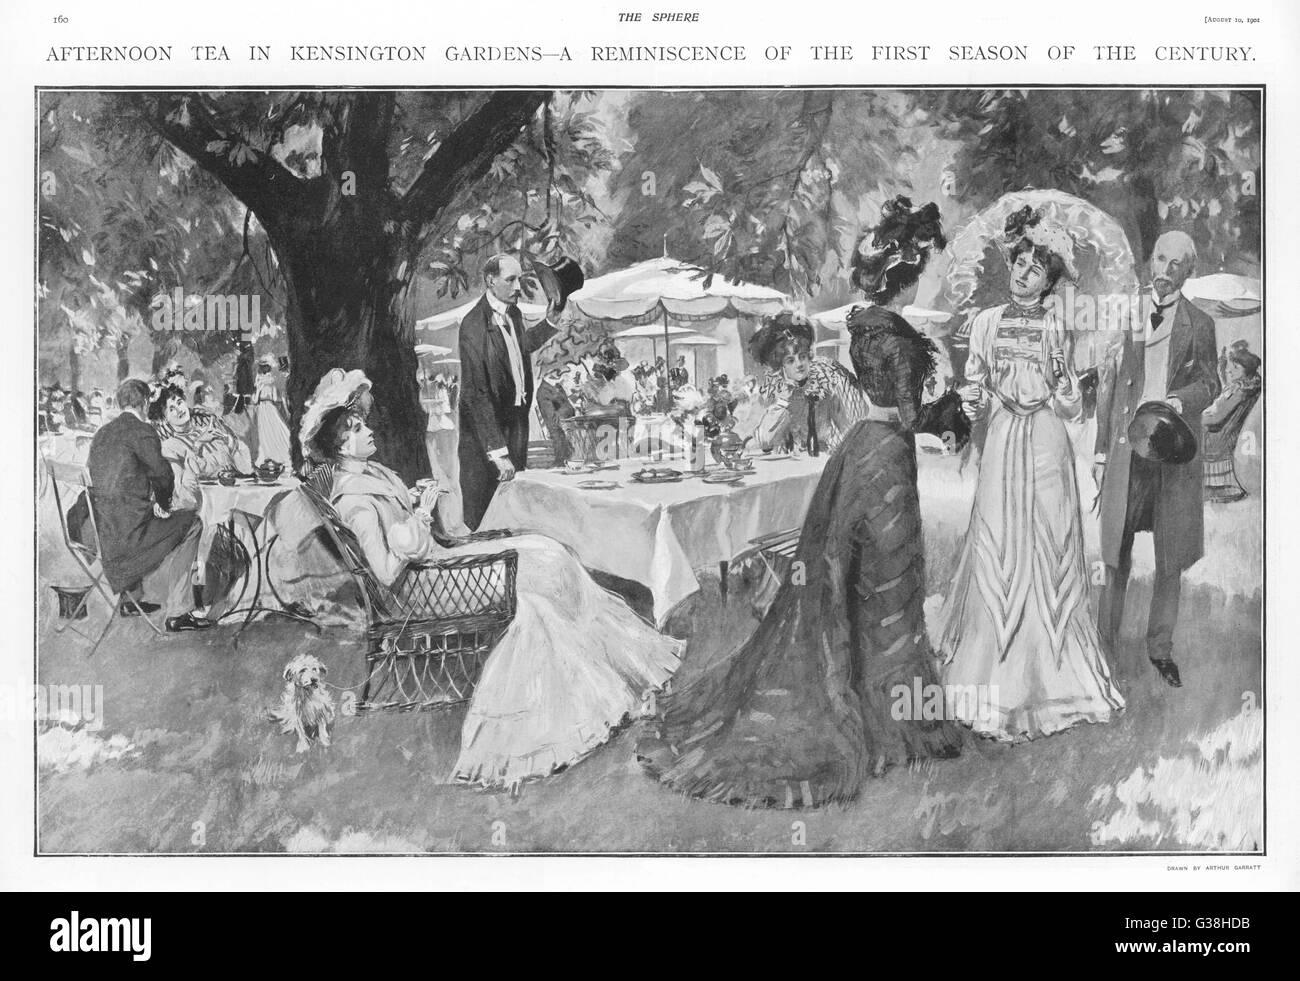 Fashionable folk take tea  during the Season, in  Kensington Gardens, London        Date: 1901 - Stock Image